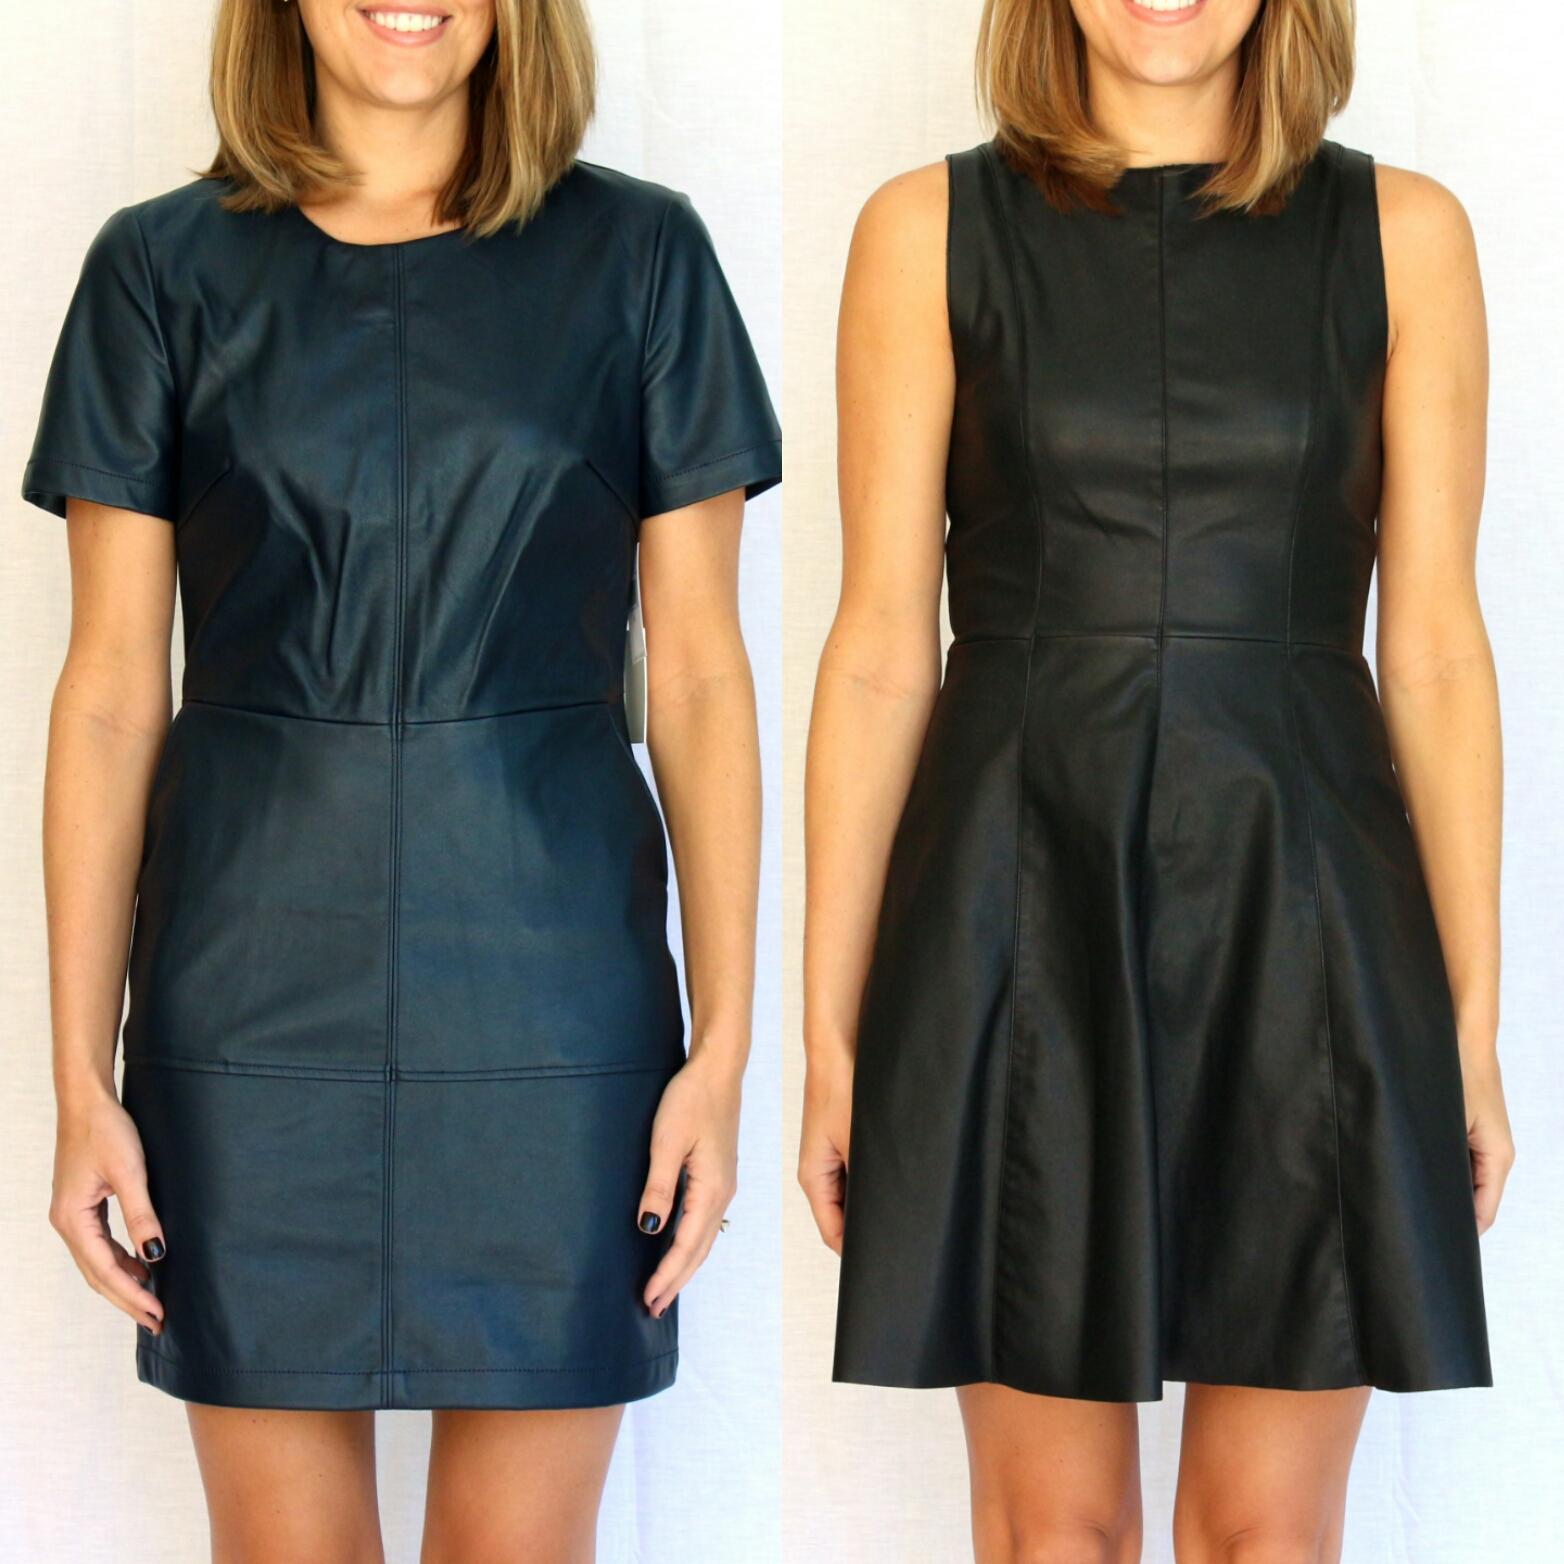 Leather sheath dresses under $80